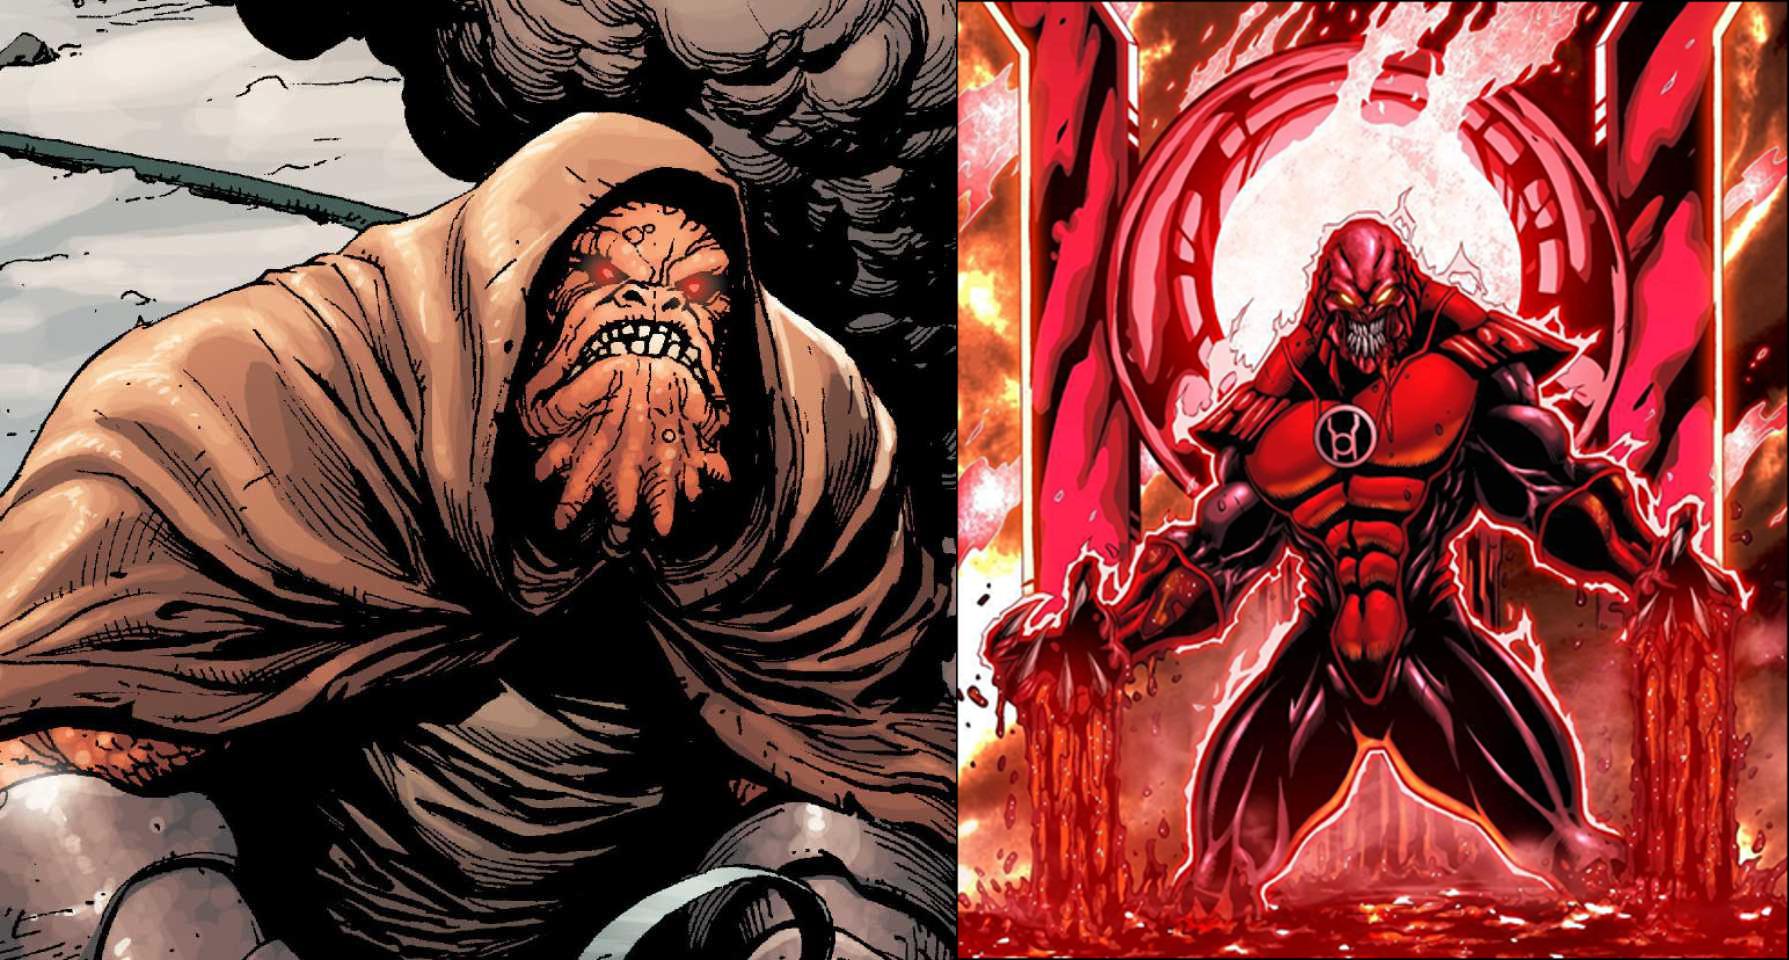 Atrocitus VS Wrath(Seven Deadly Enemies of Men)